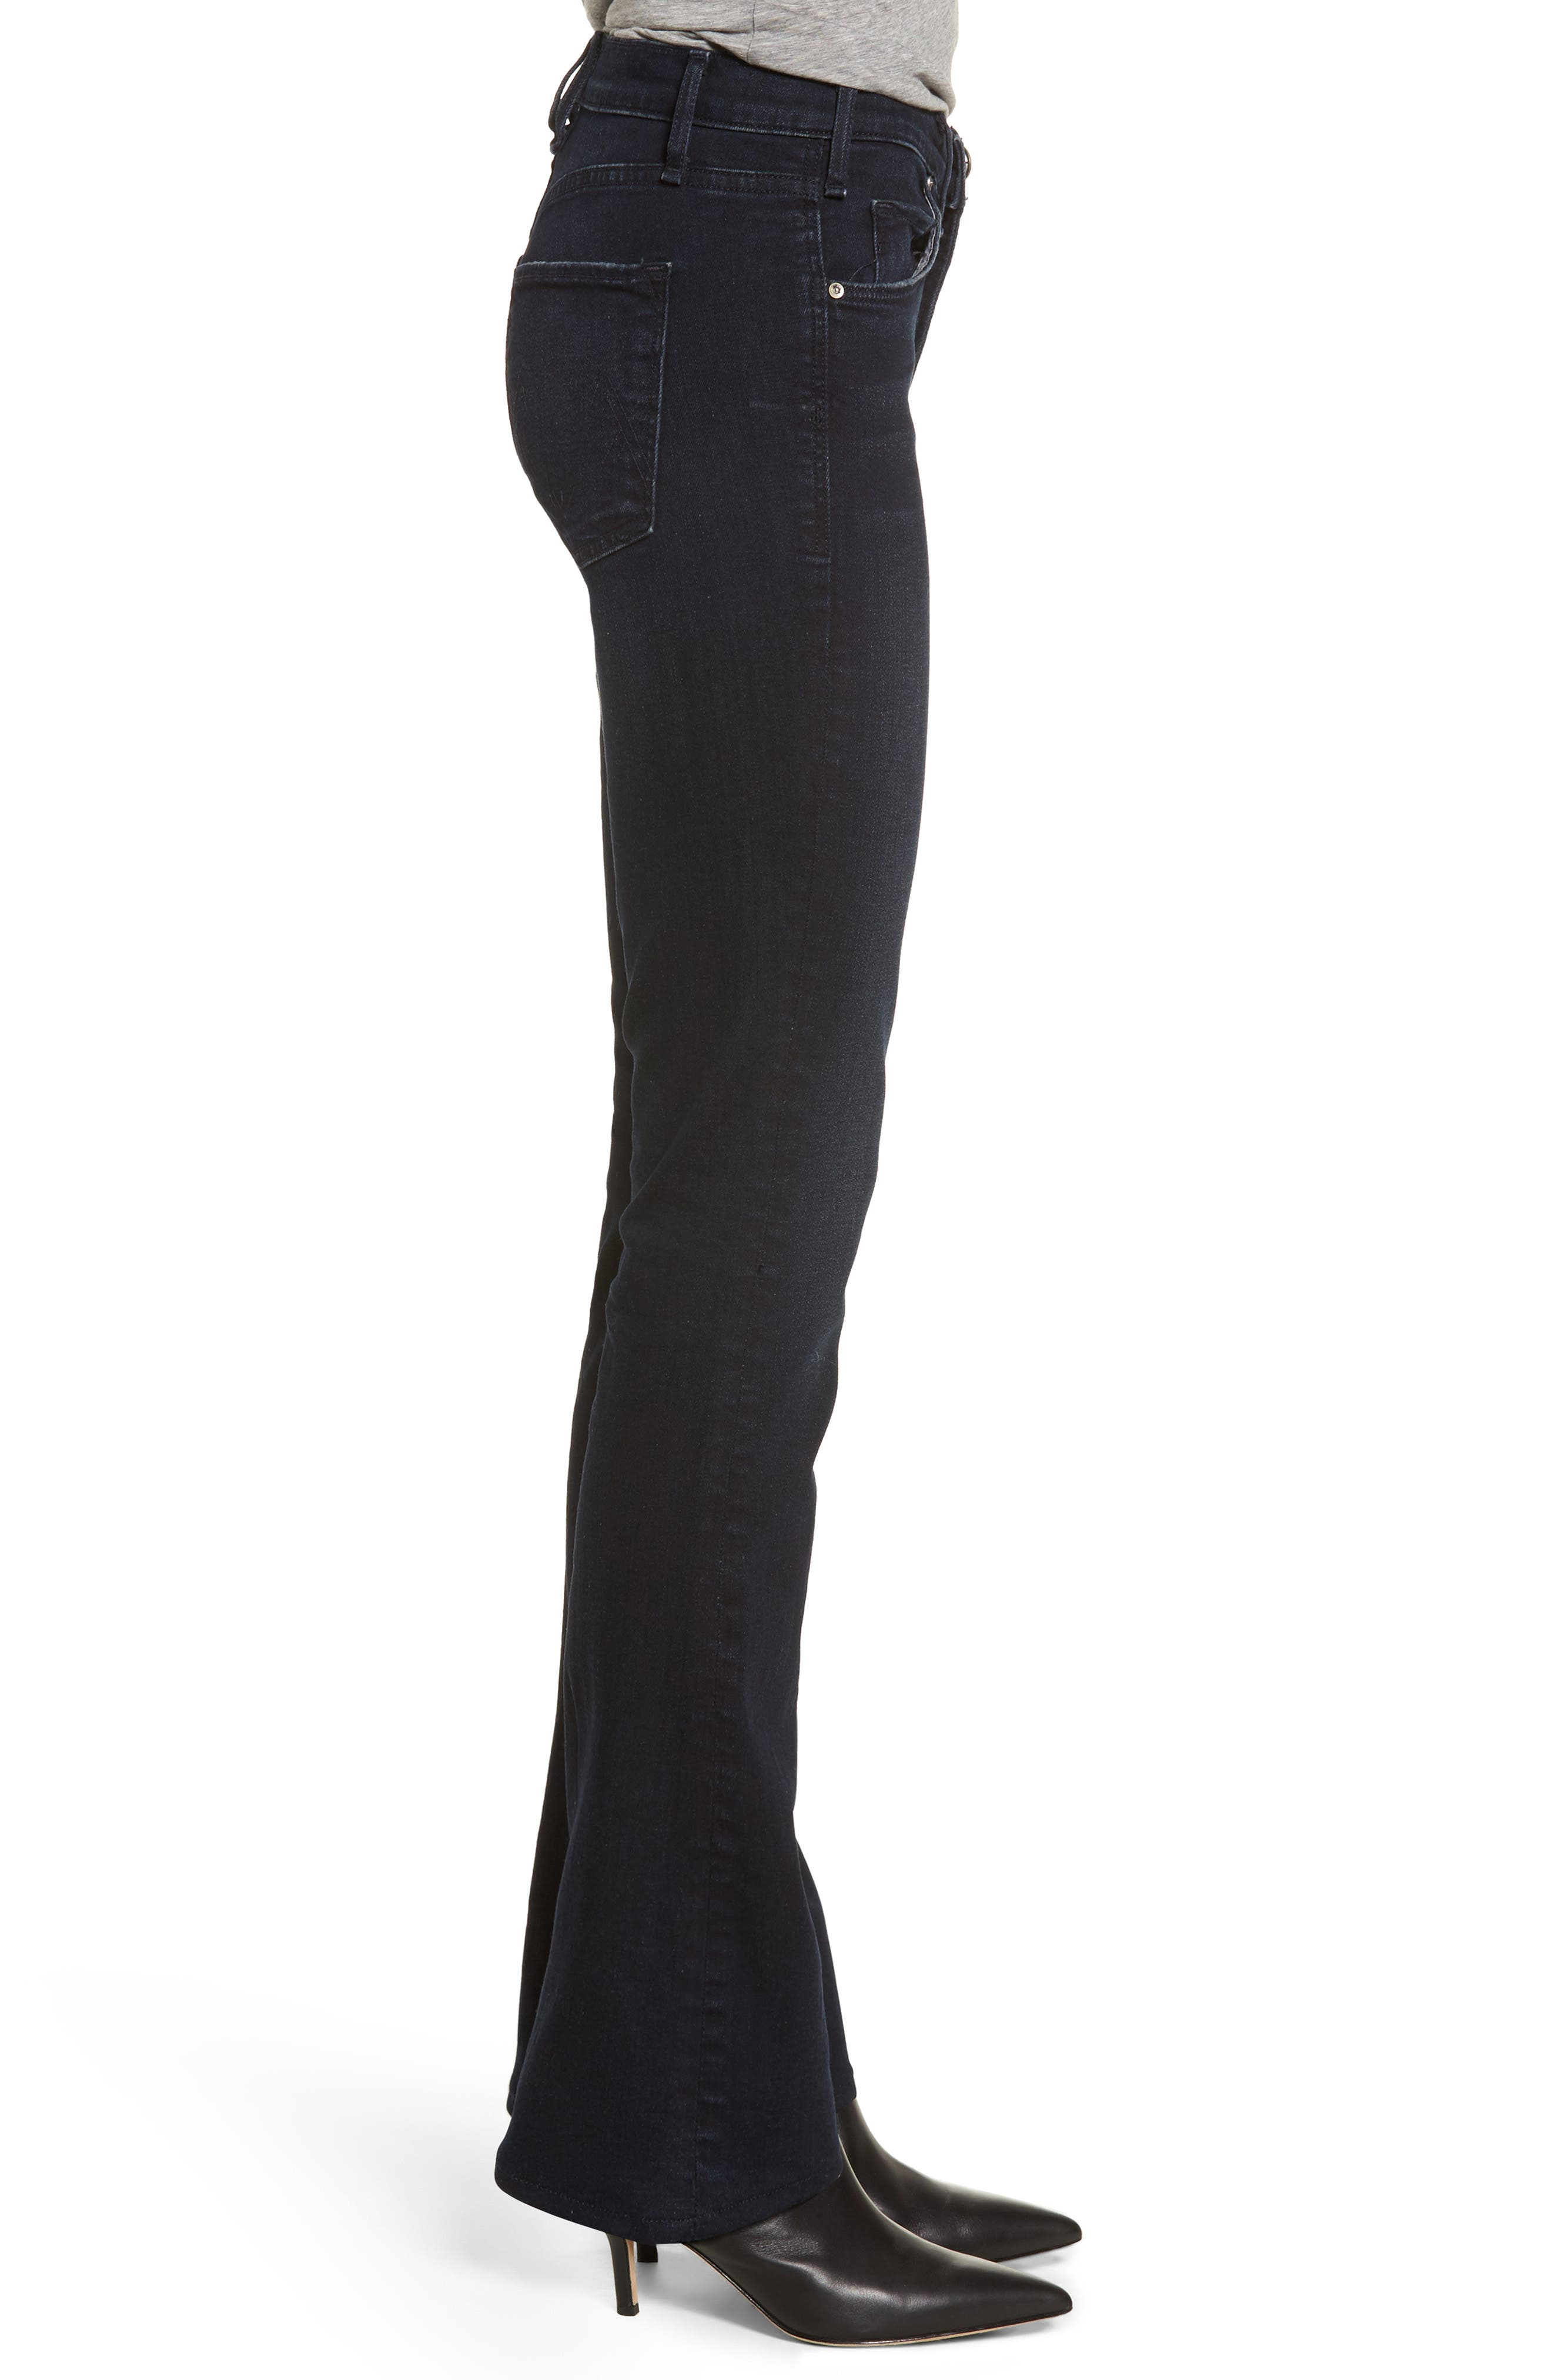 Alternate Image 3  - McGuire Gainsbourg Bootcut Jeans (Aja)